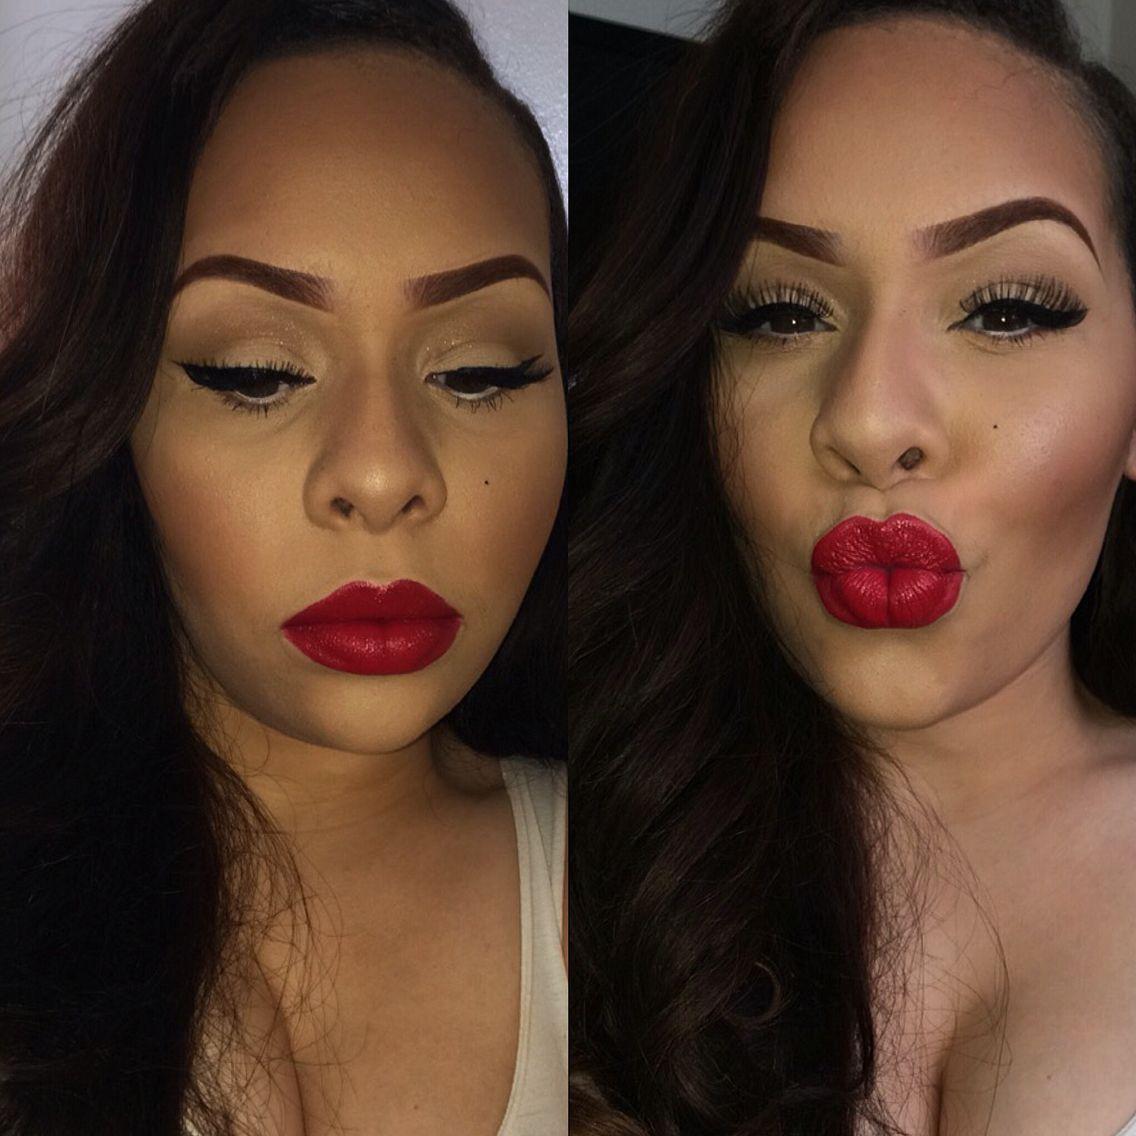 #ohriyaofficial #makeupbyriya #boldlippie red lips brown eyes